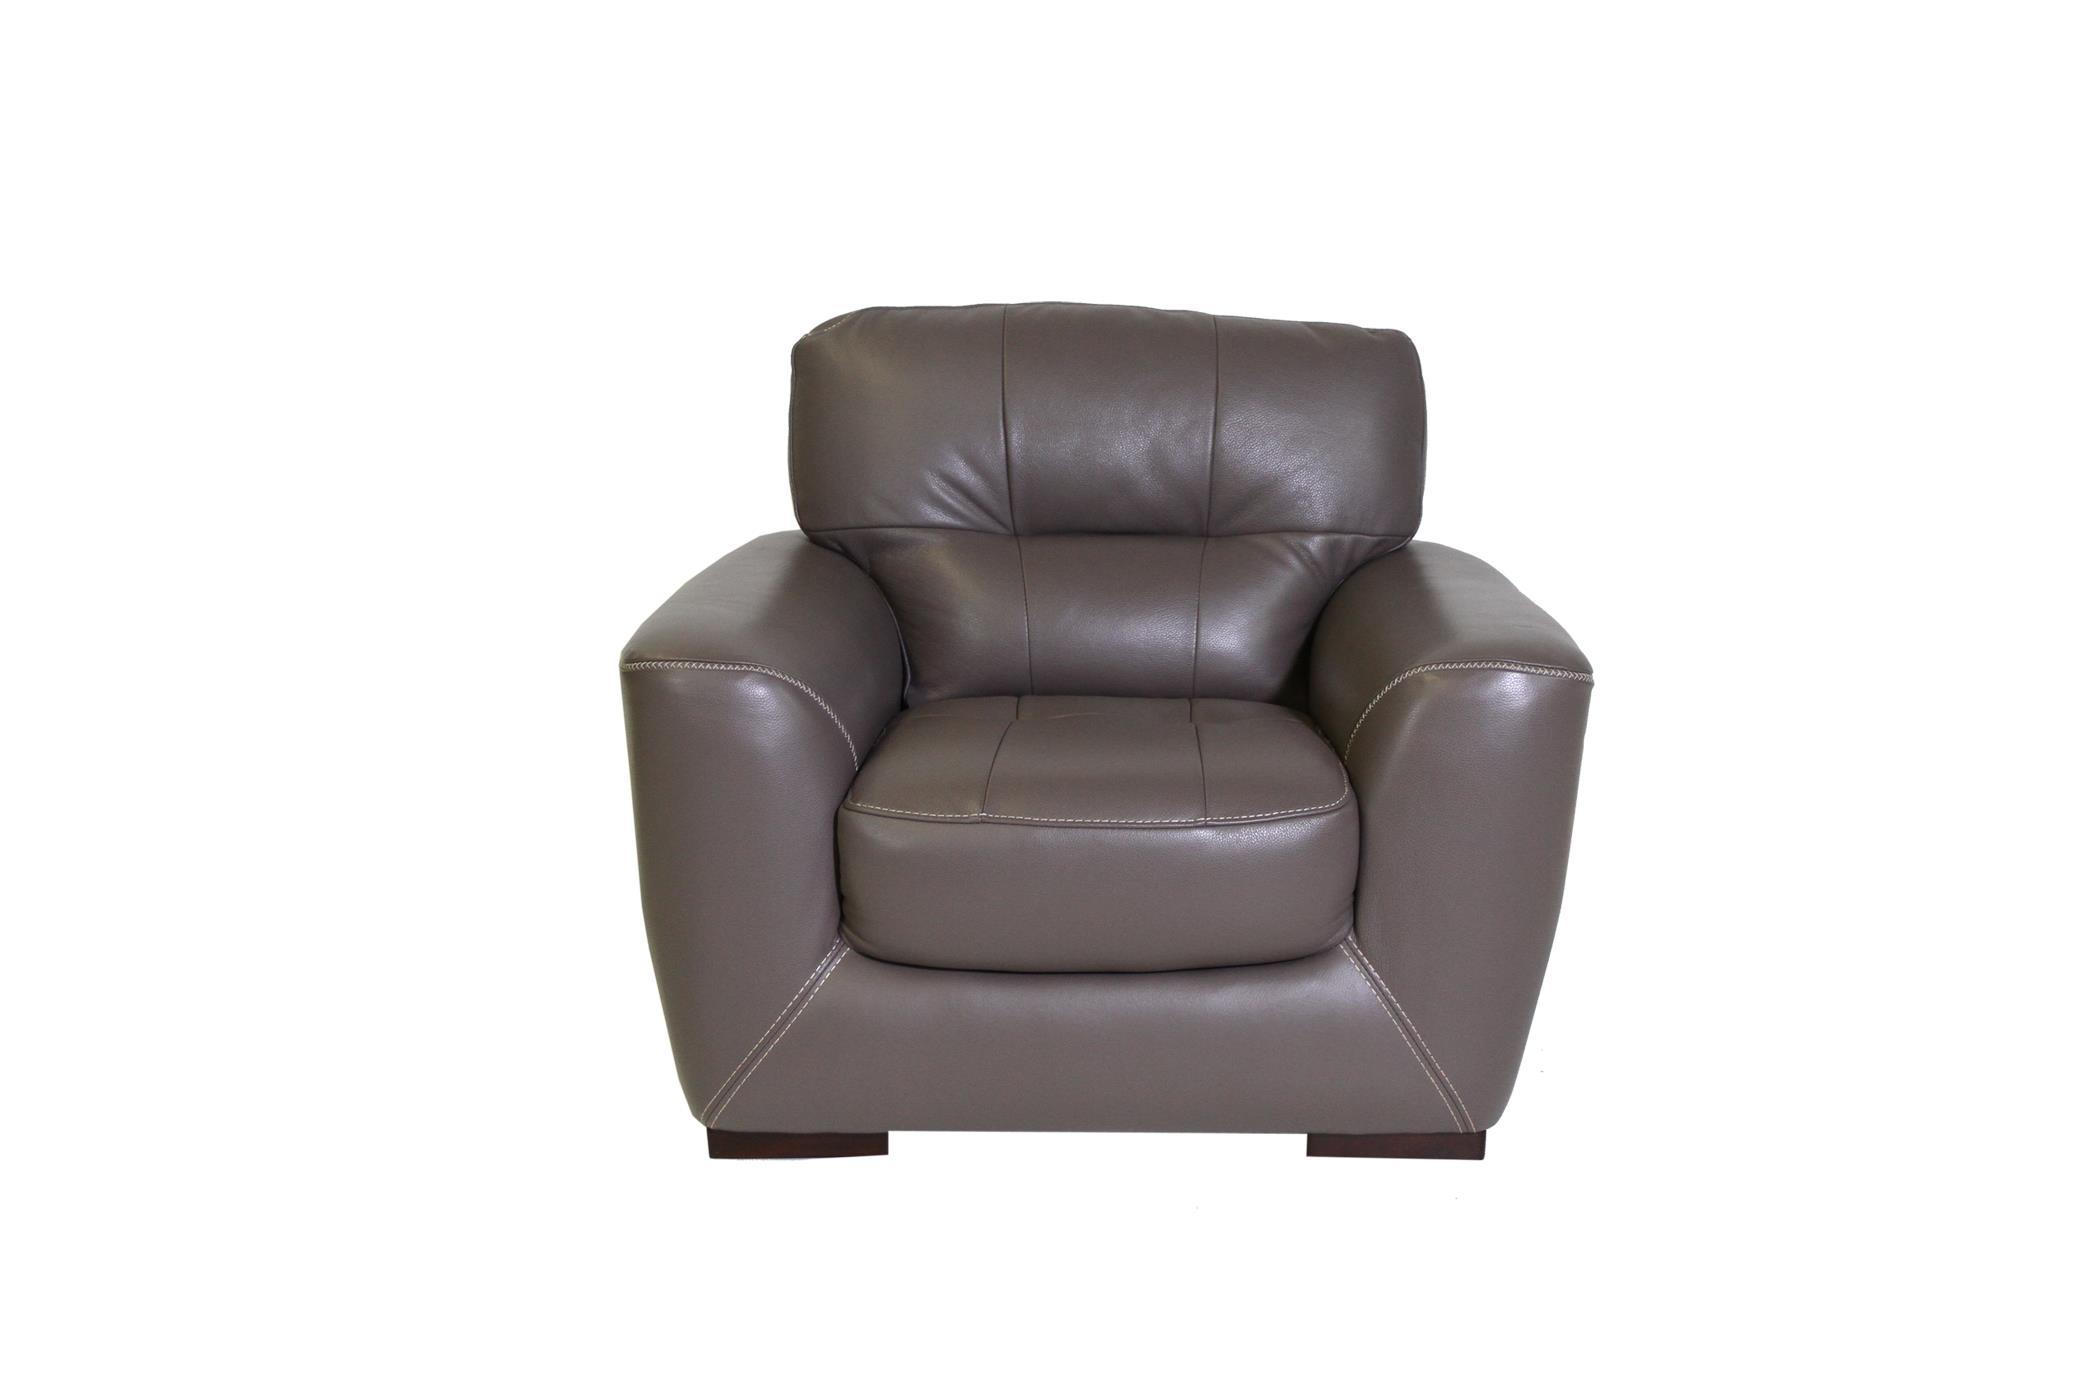 Violino Twilight Chair - Item Number: 30558-1P Twilight